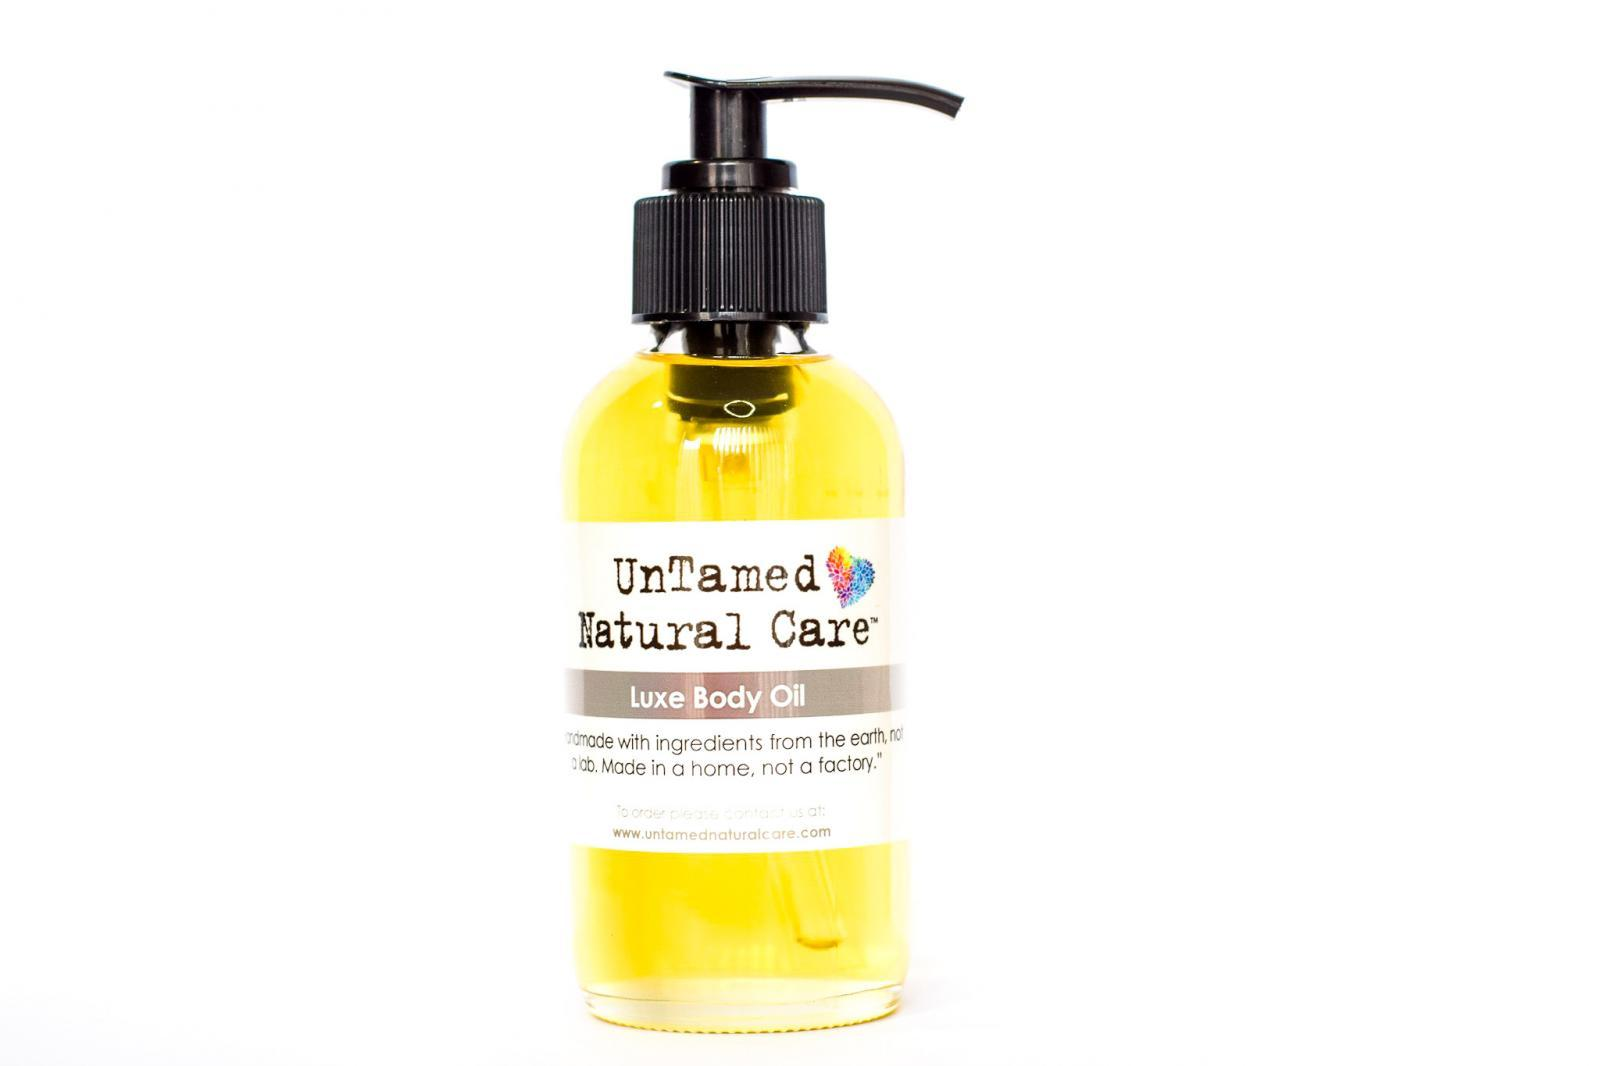 Luxe Body Oil